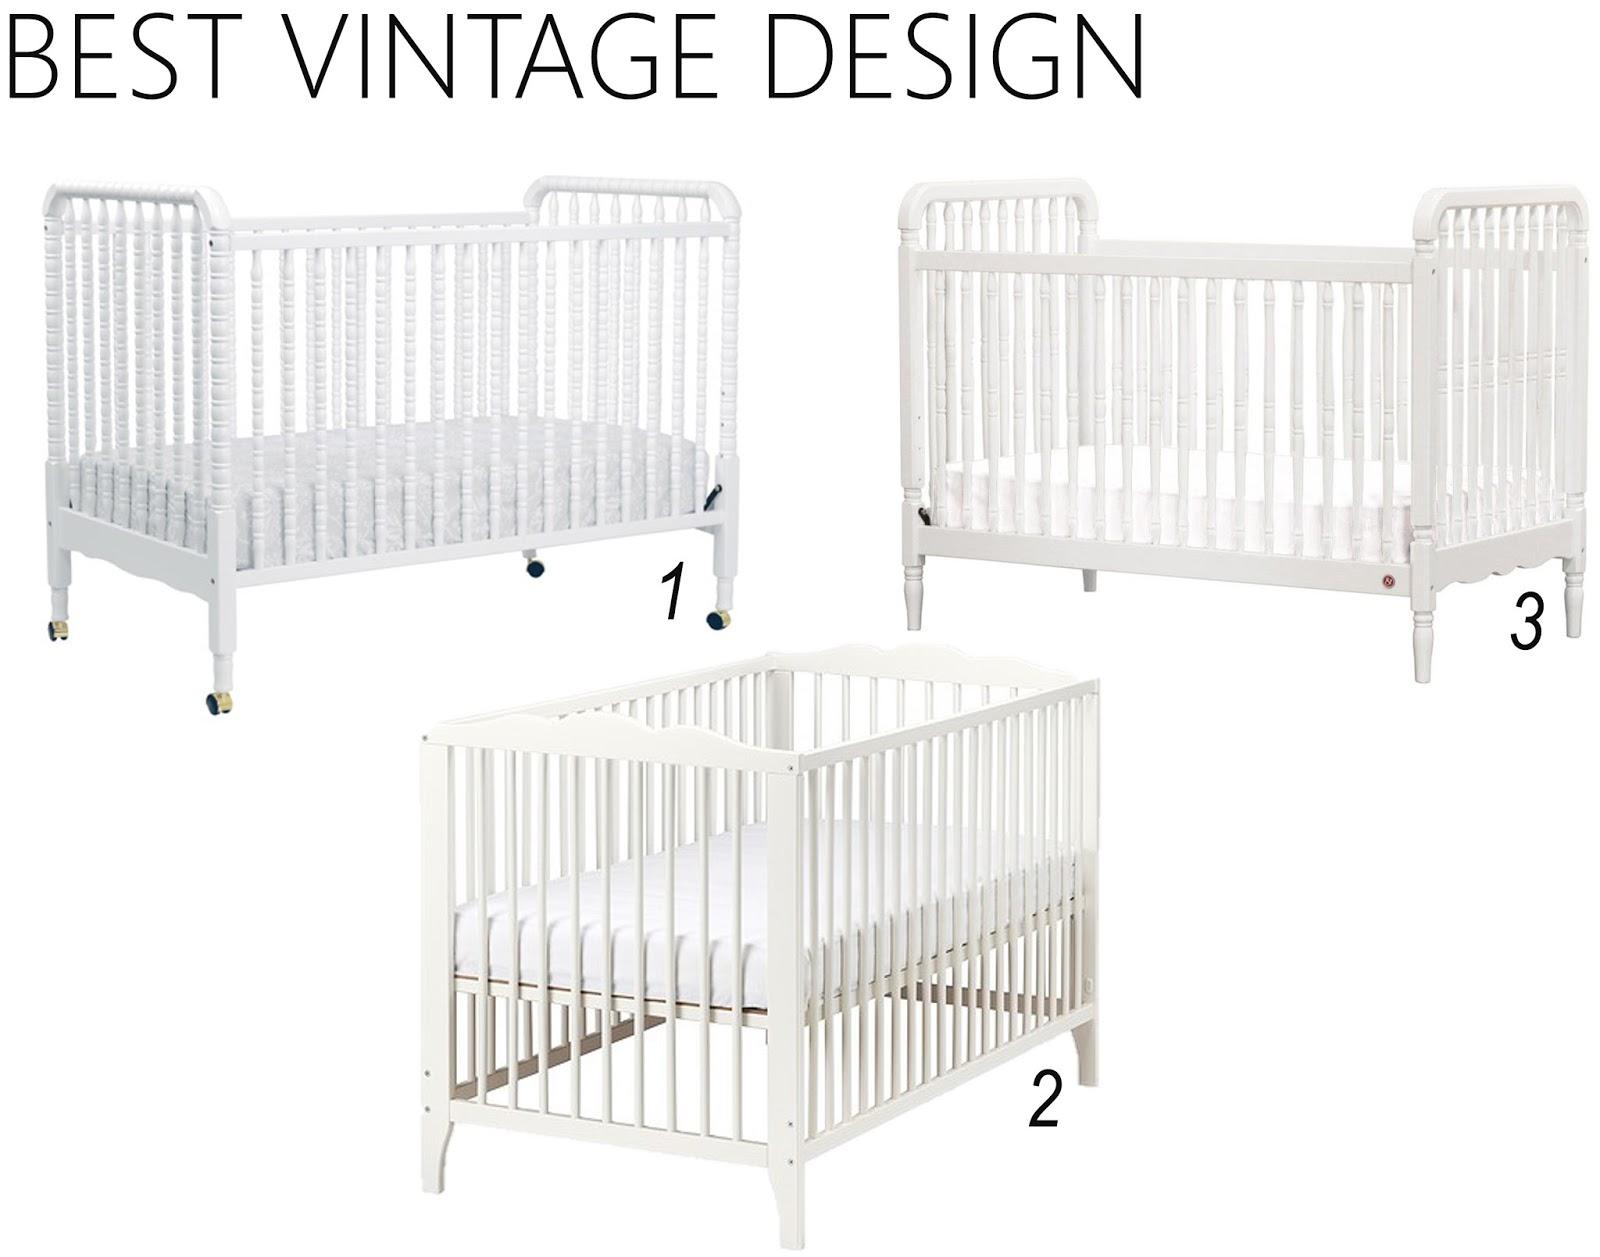 Vintage white crib for sale - Vintage Style Cribs